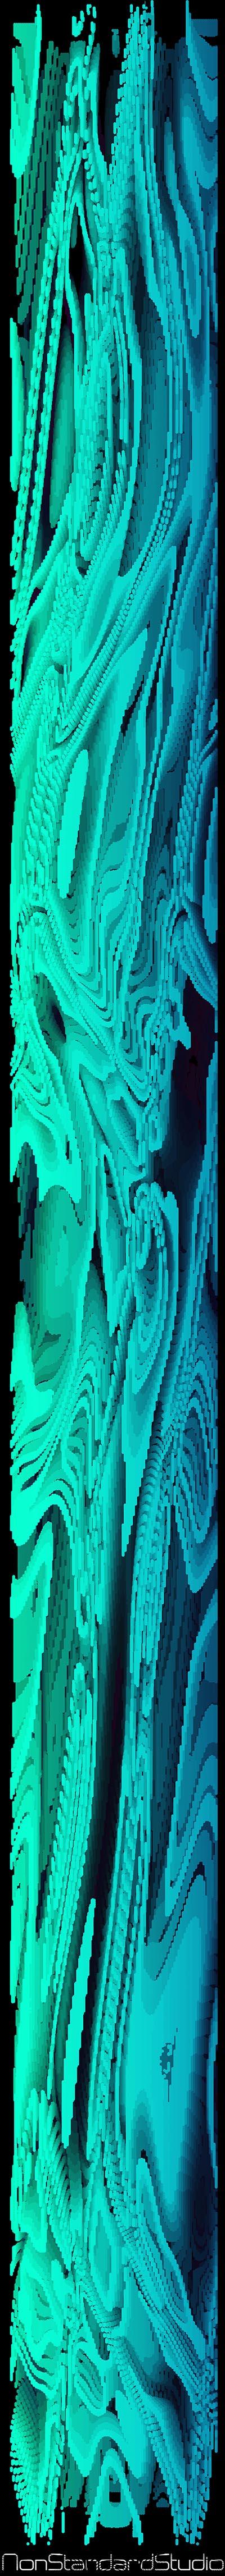 sematectonicUrbanFields-nss001